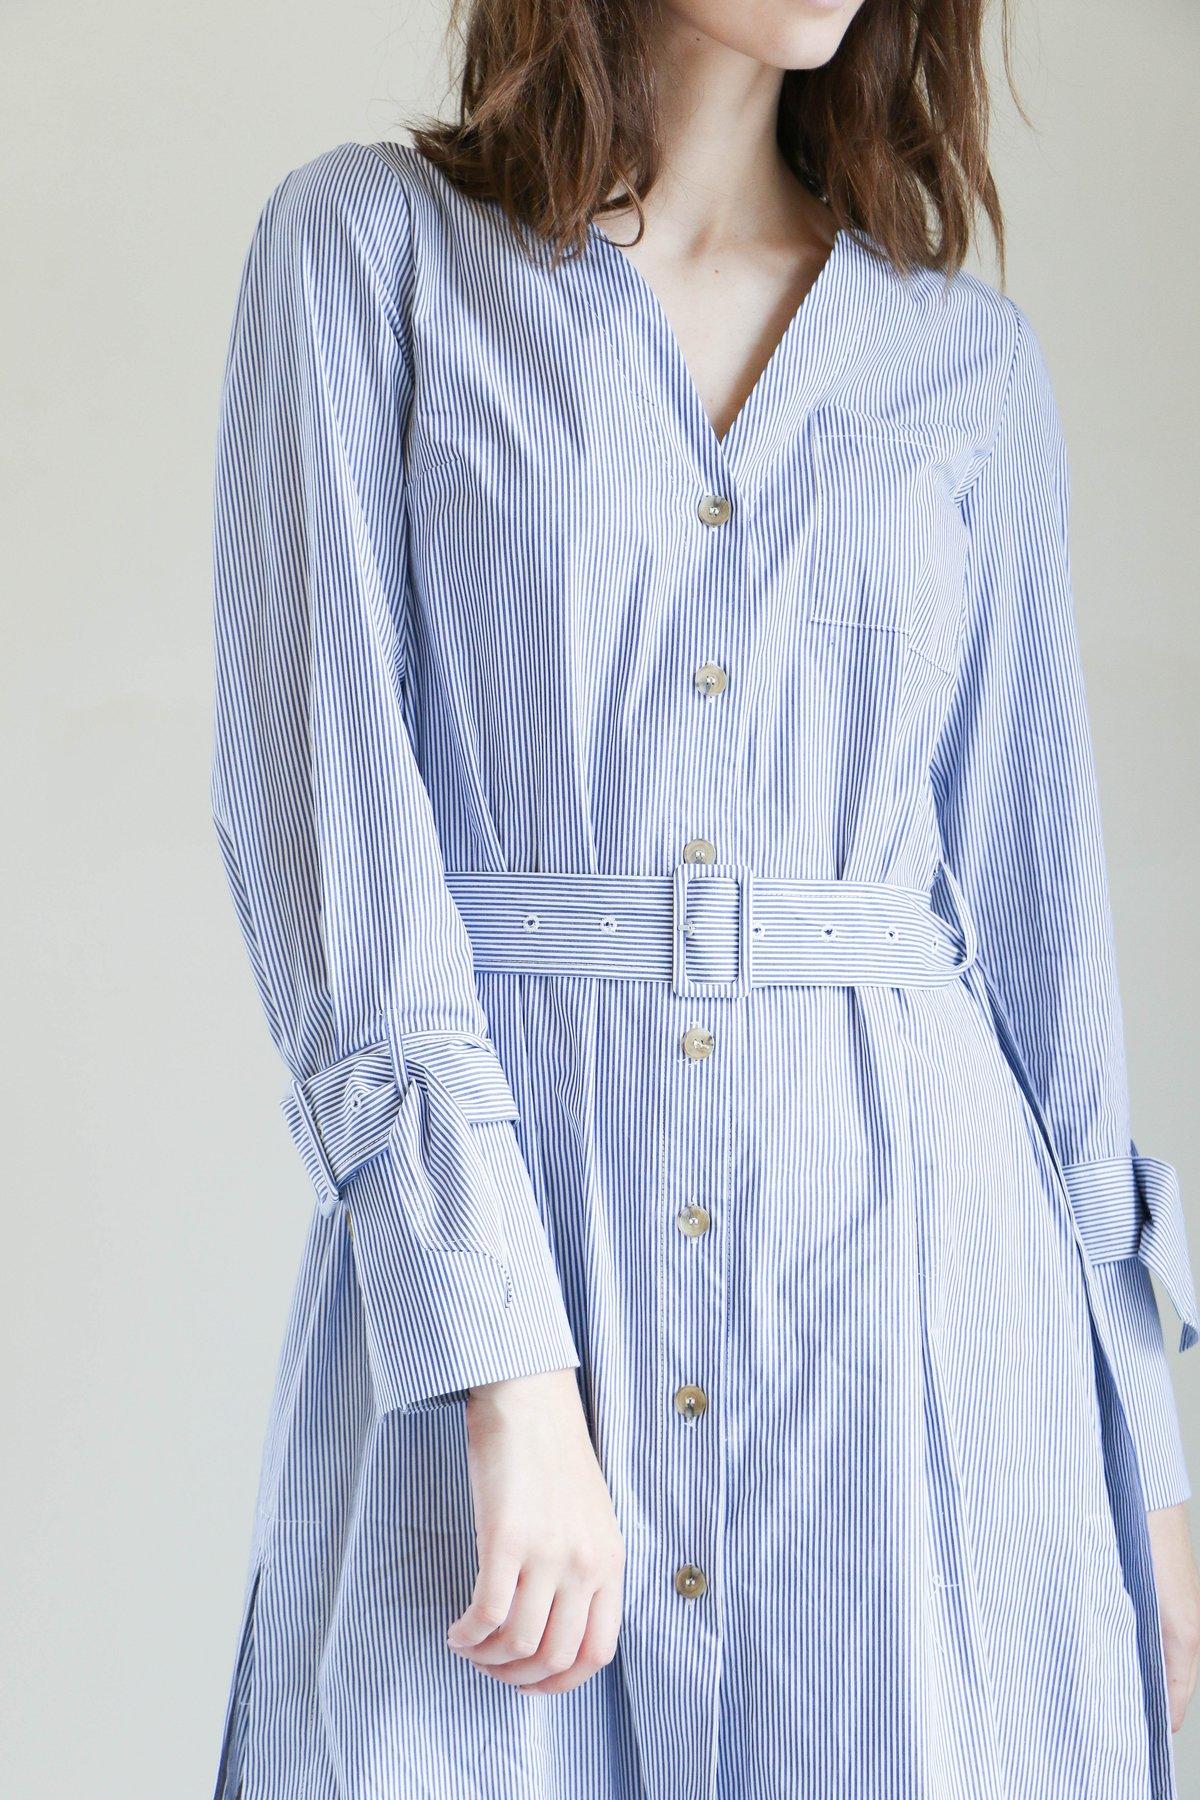 Sea diagonal placket dress Buy Cheap Enjoy Cheapest Price Cheap Price Buy Cheap Perfect For Nice For Sale Outlet Footlocker RPXzec